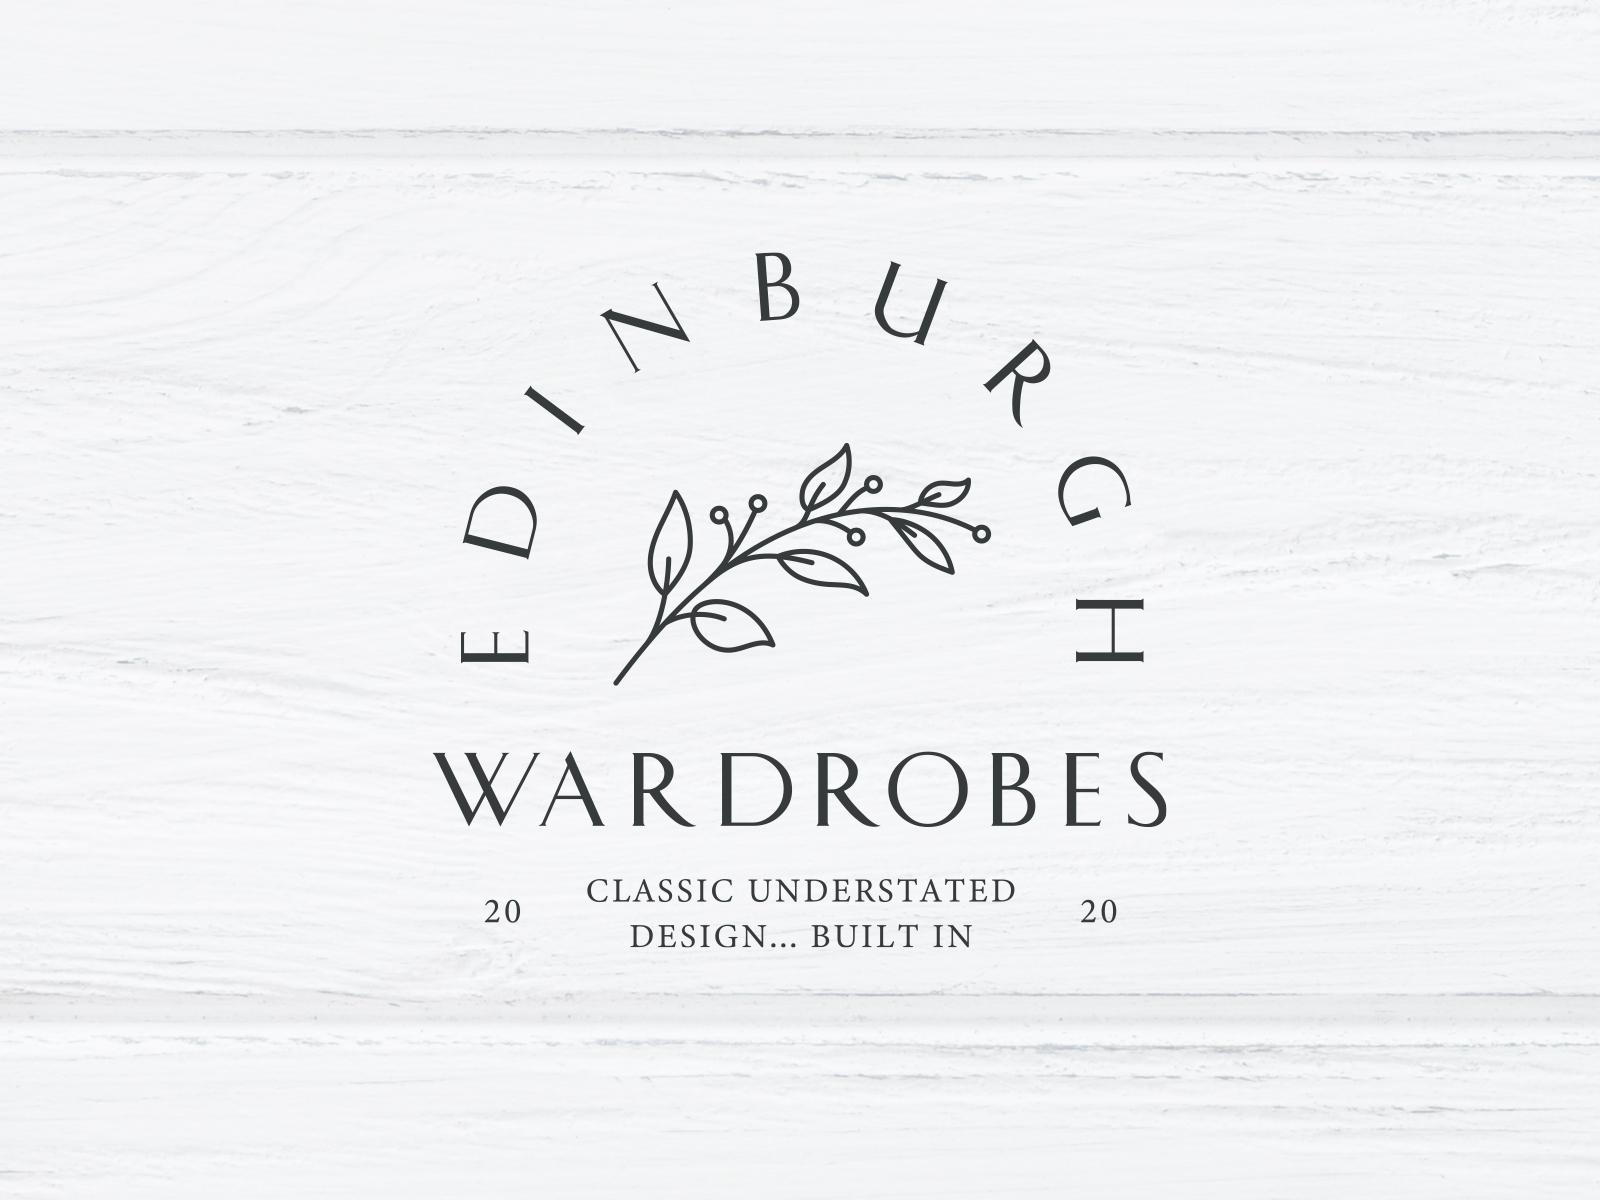 Edinburgh Wardrobes by Crusoe Design Co. on Dribbble